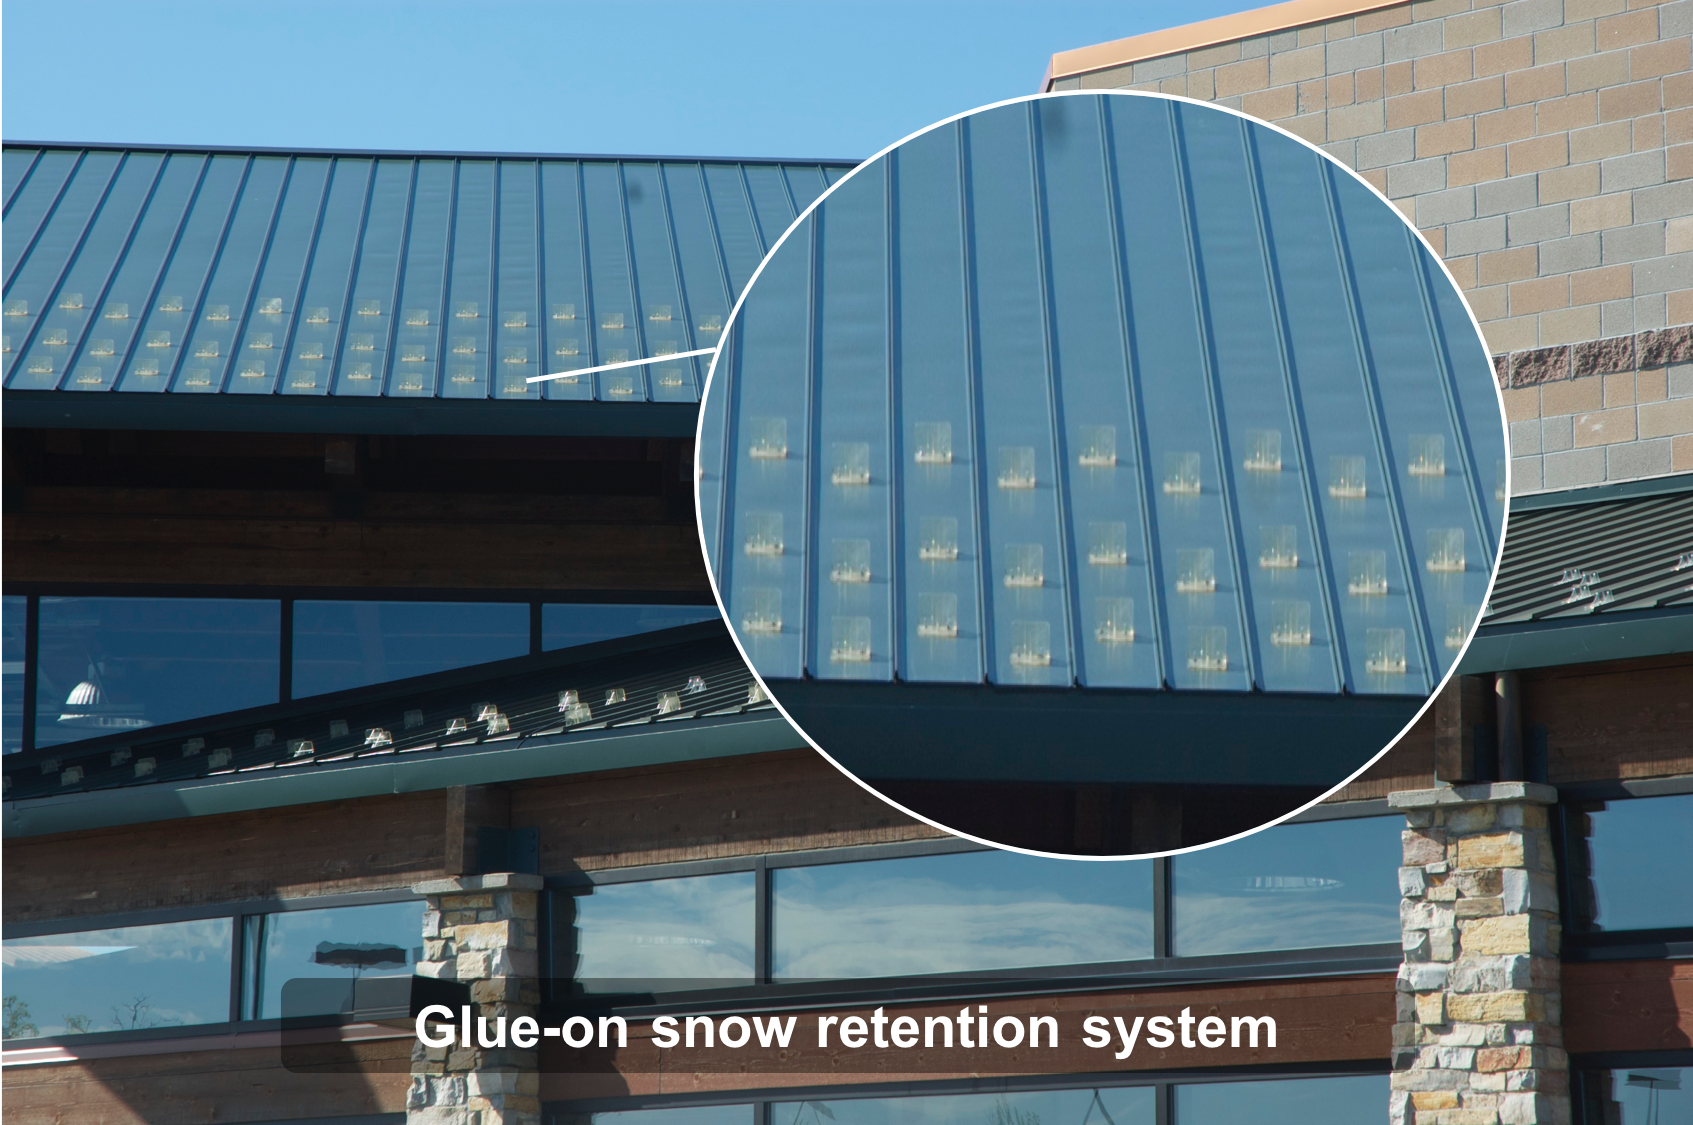 Glue-on snow retention system